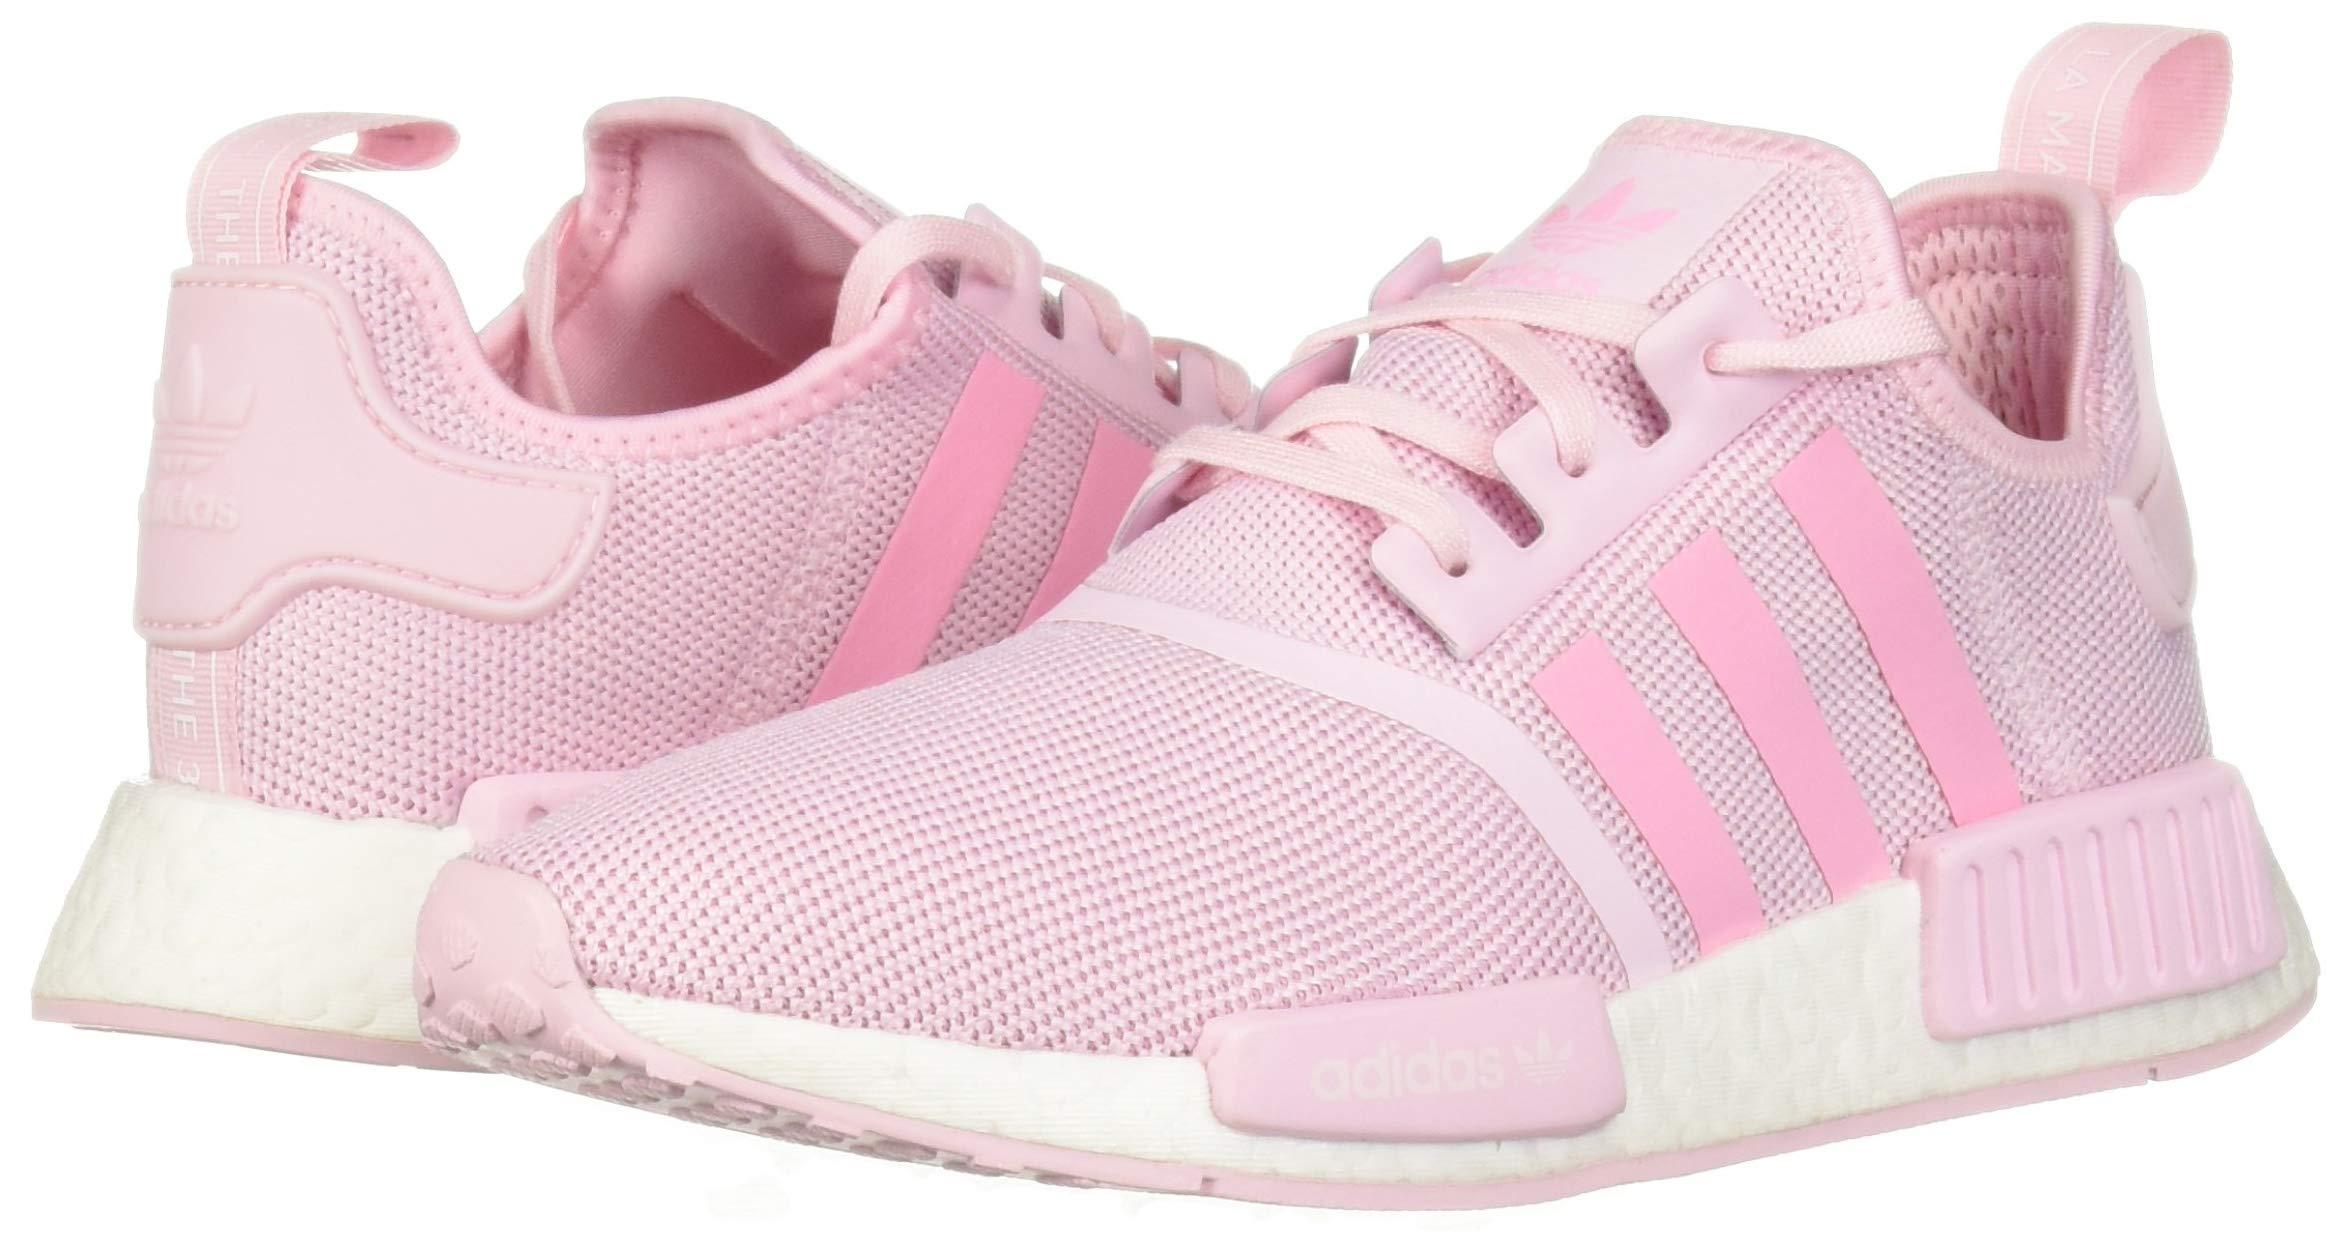 adidas Originals Unisex NMD_R1 Running Shoe Clear Shock Pink/White, 3.5 M US Big Kid by adidas Originals (Image #5)